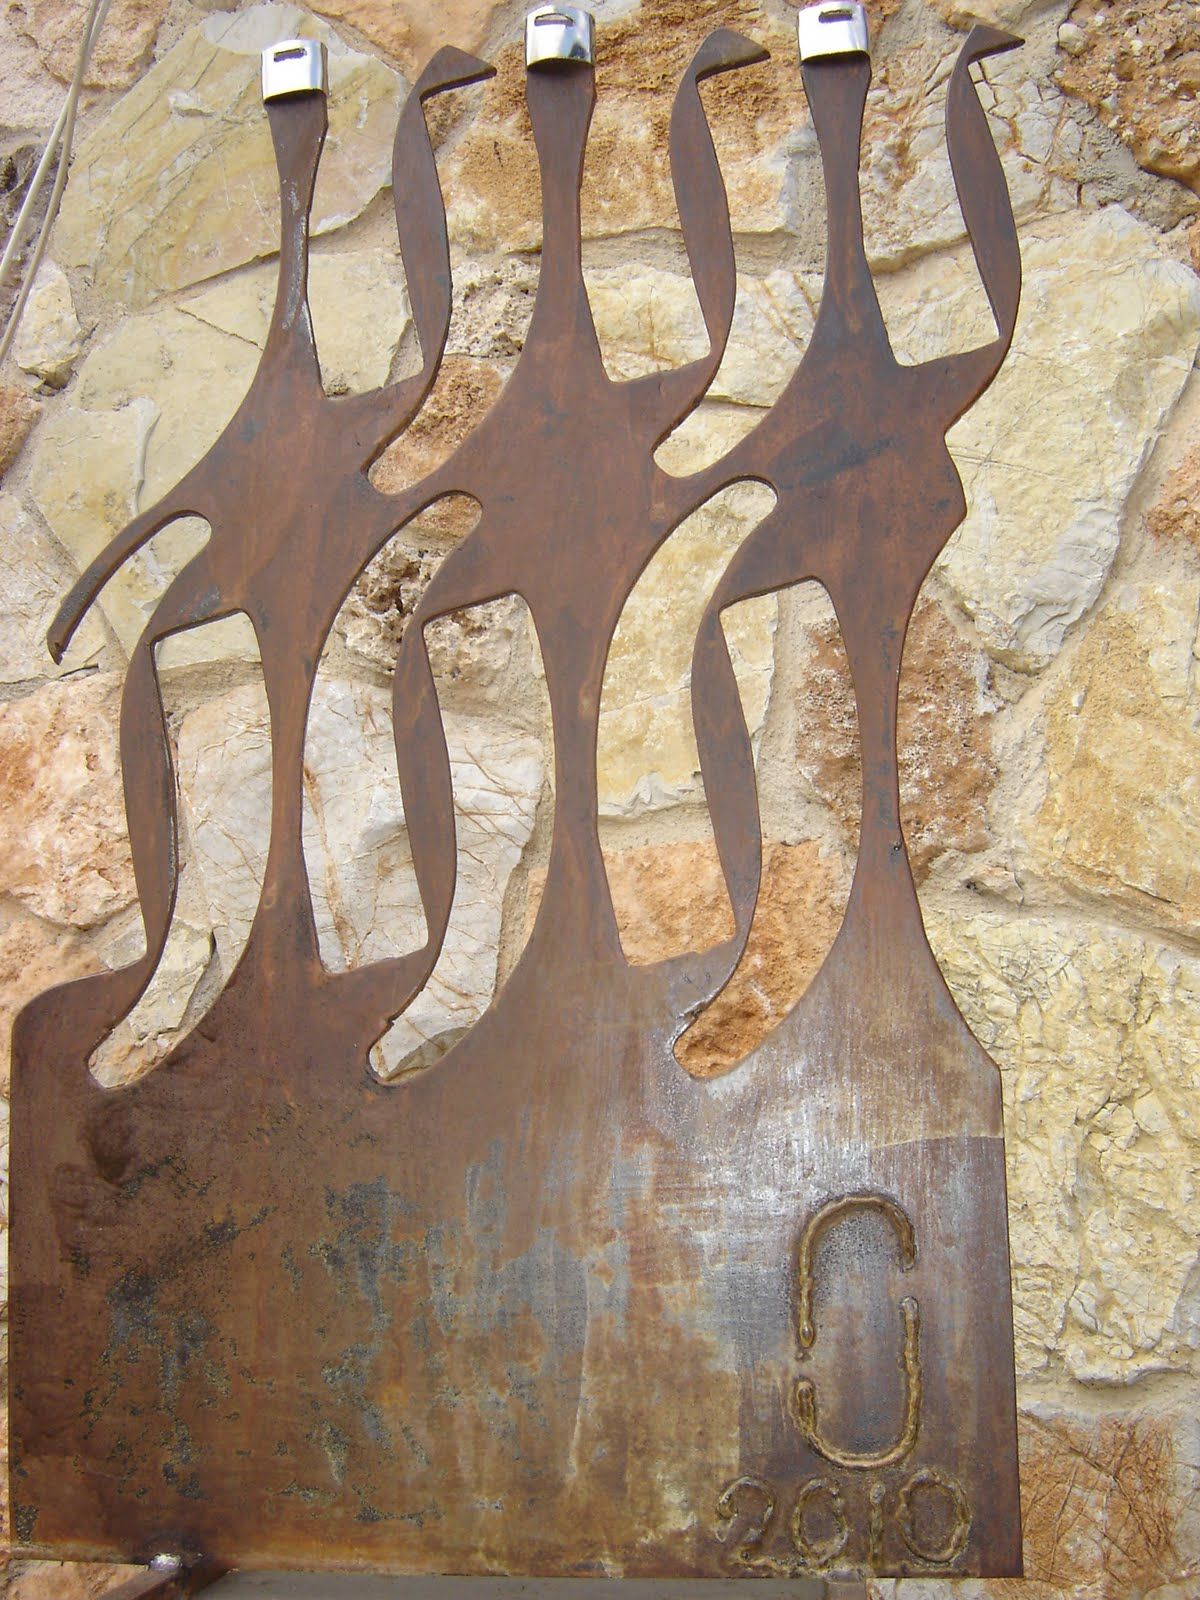 Binisalem Spain  City pictures : Arte en Hierro Juan Jose Oliva Cerezo: Las Bailarinas escultura